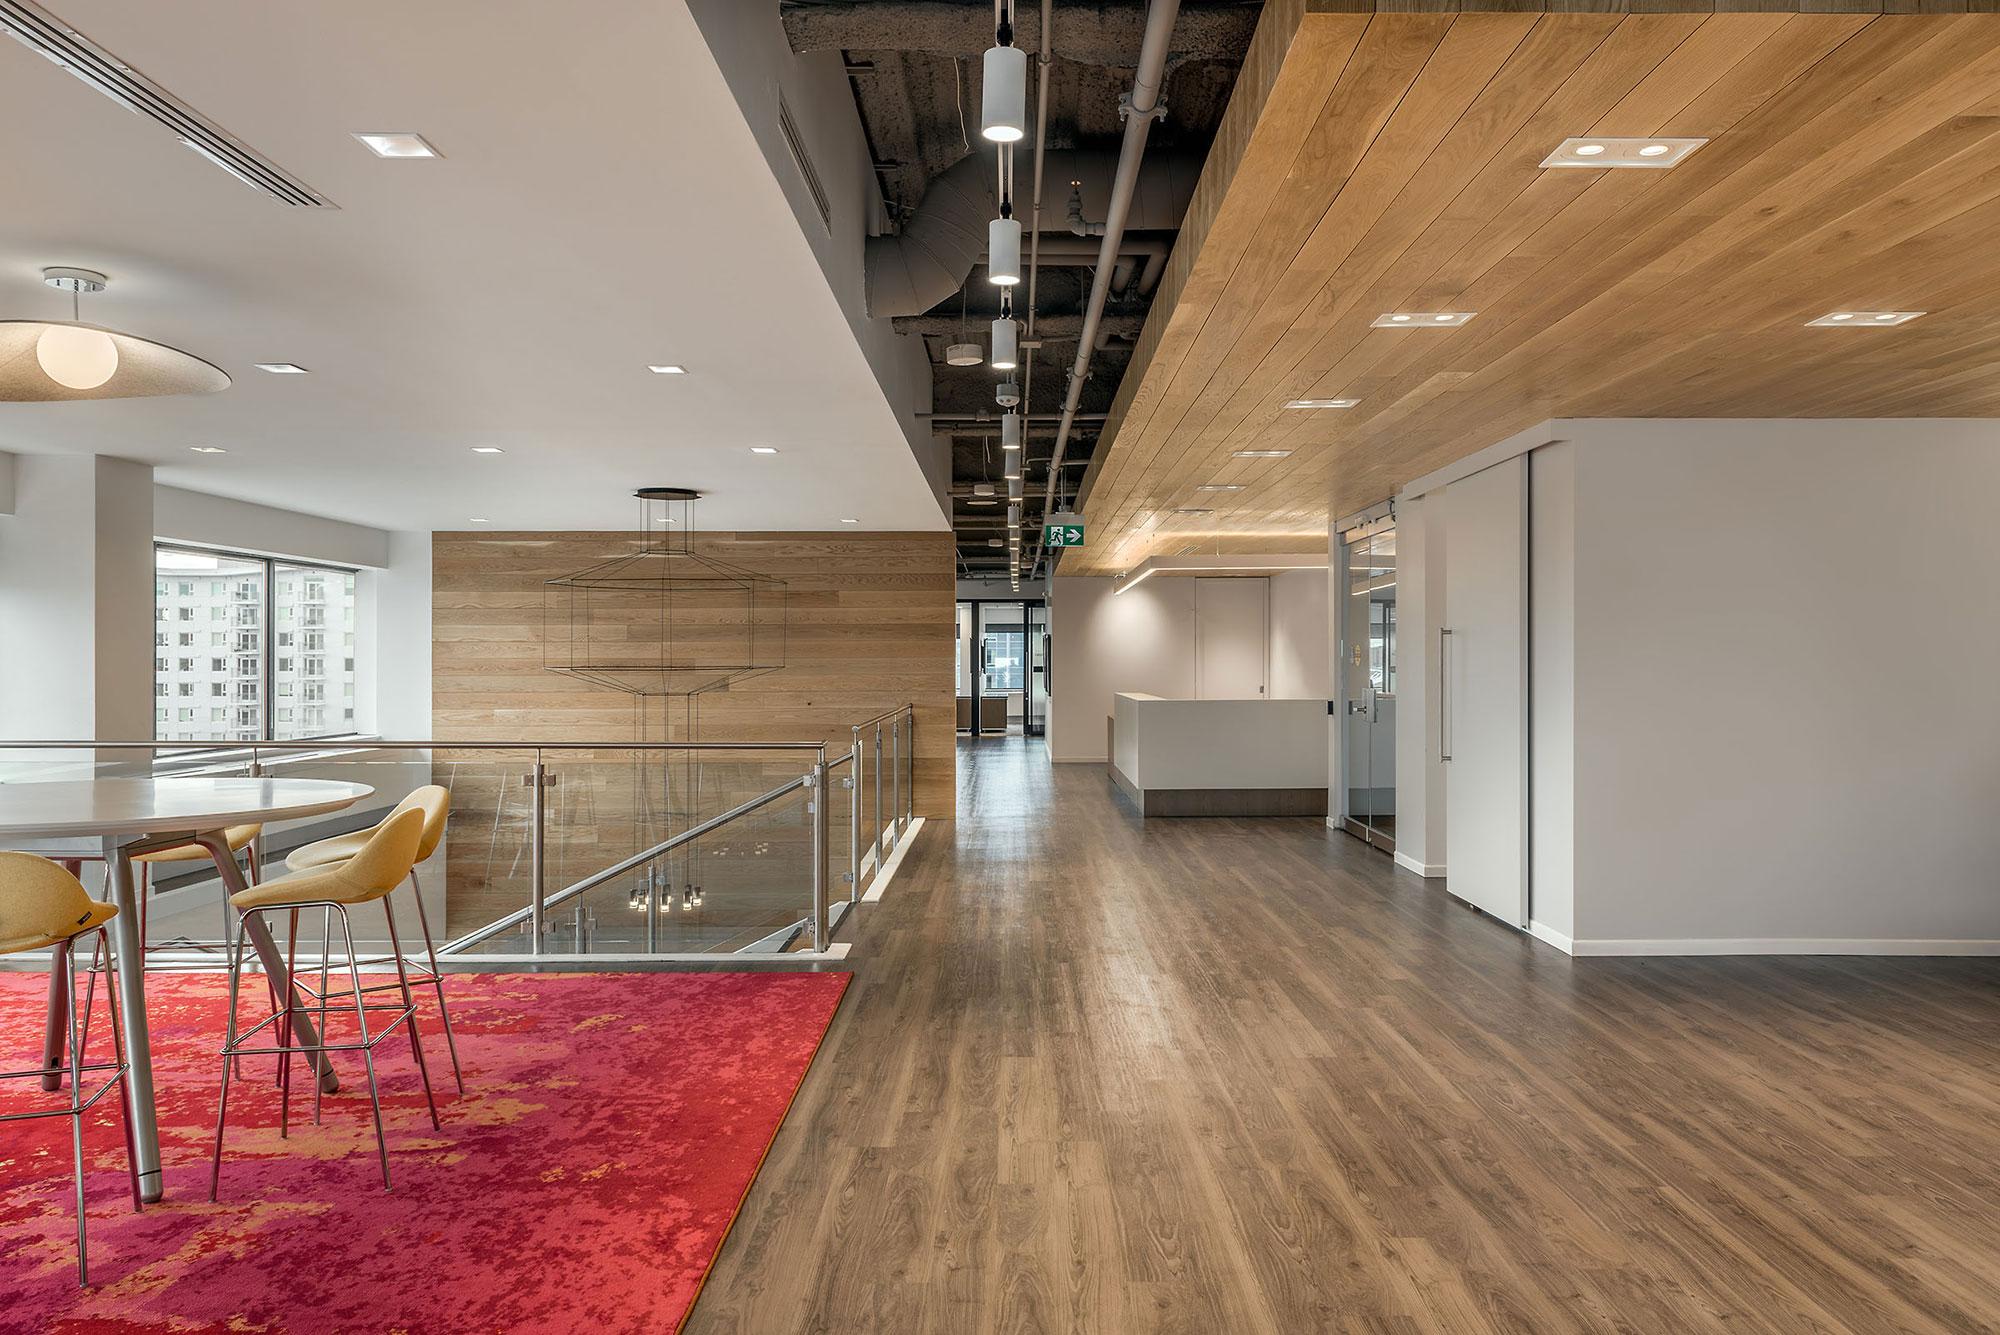 interior-design-financial-services-common-area.jpg